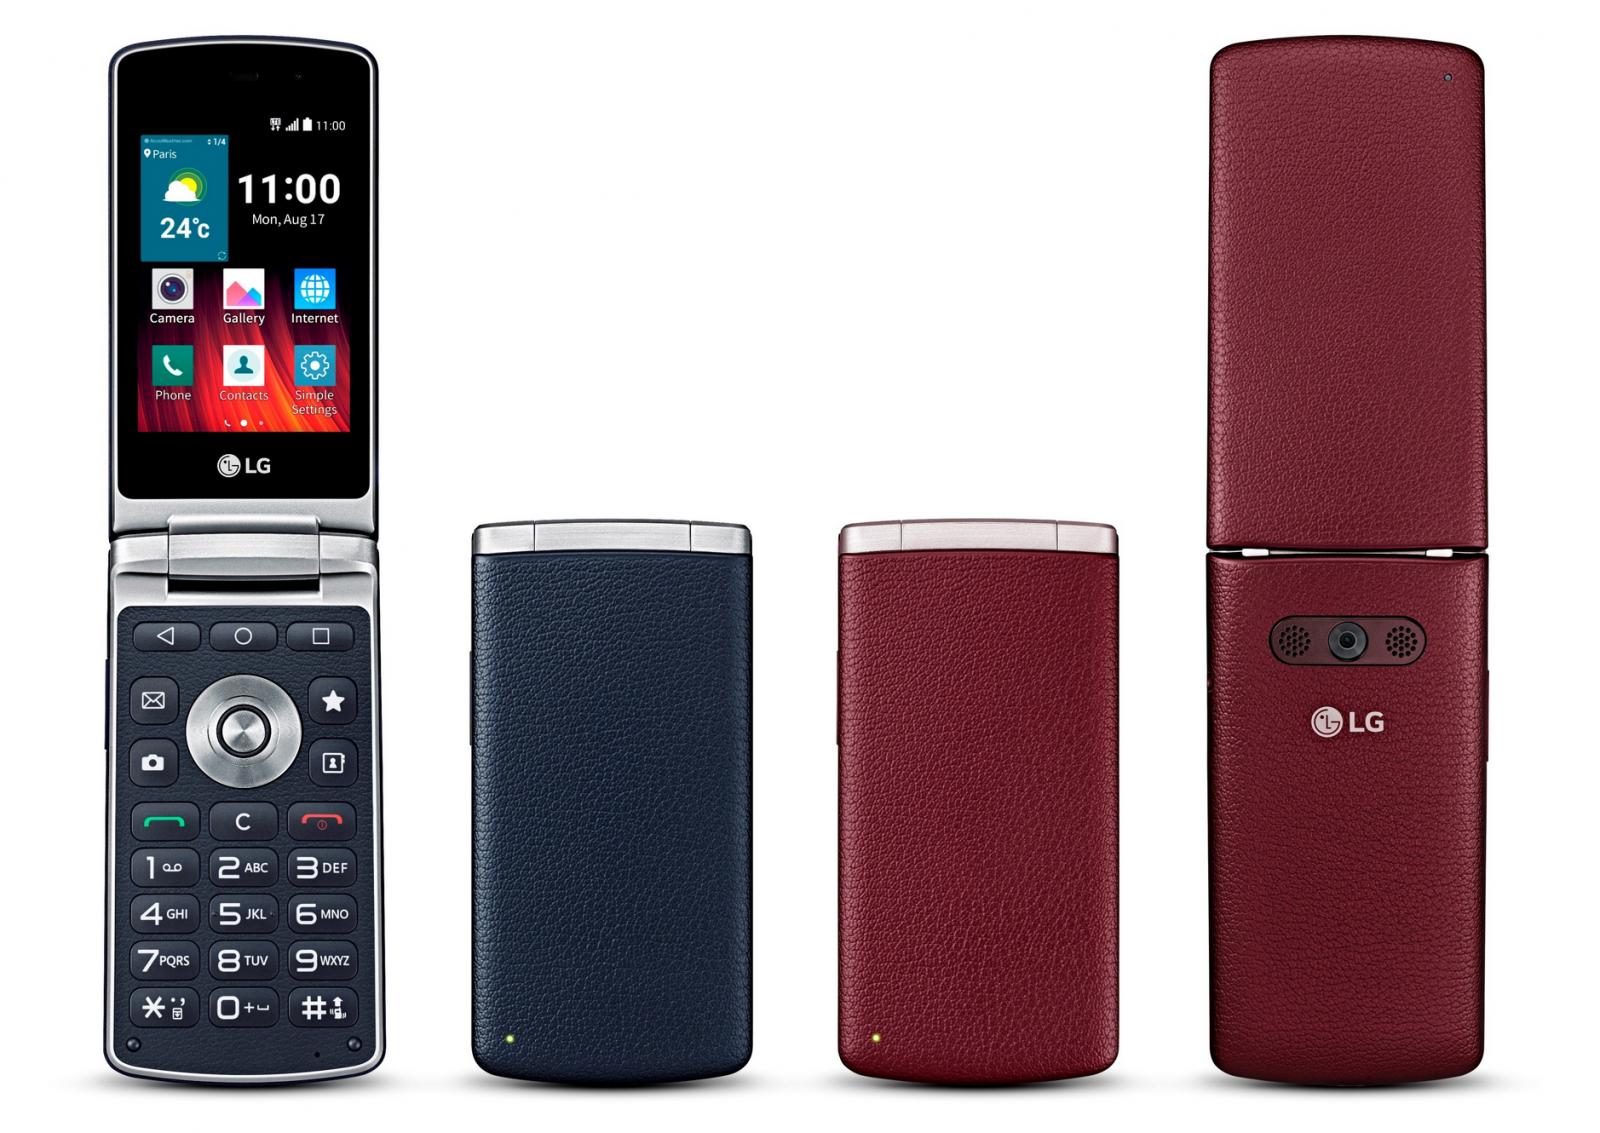 LG Wine Smart Flip Phone UK launch